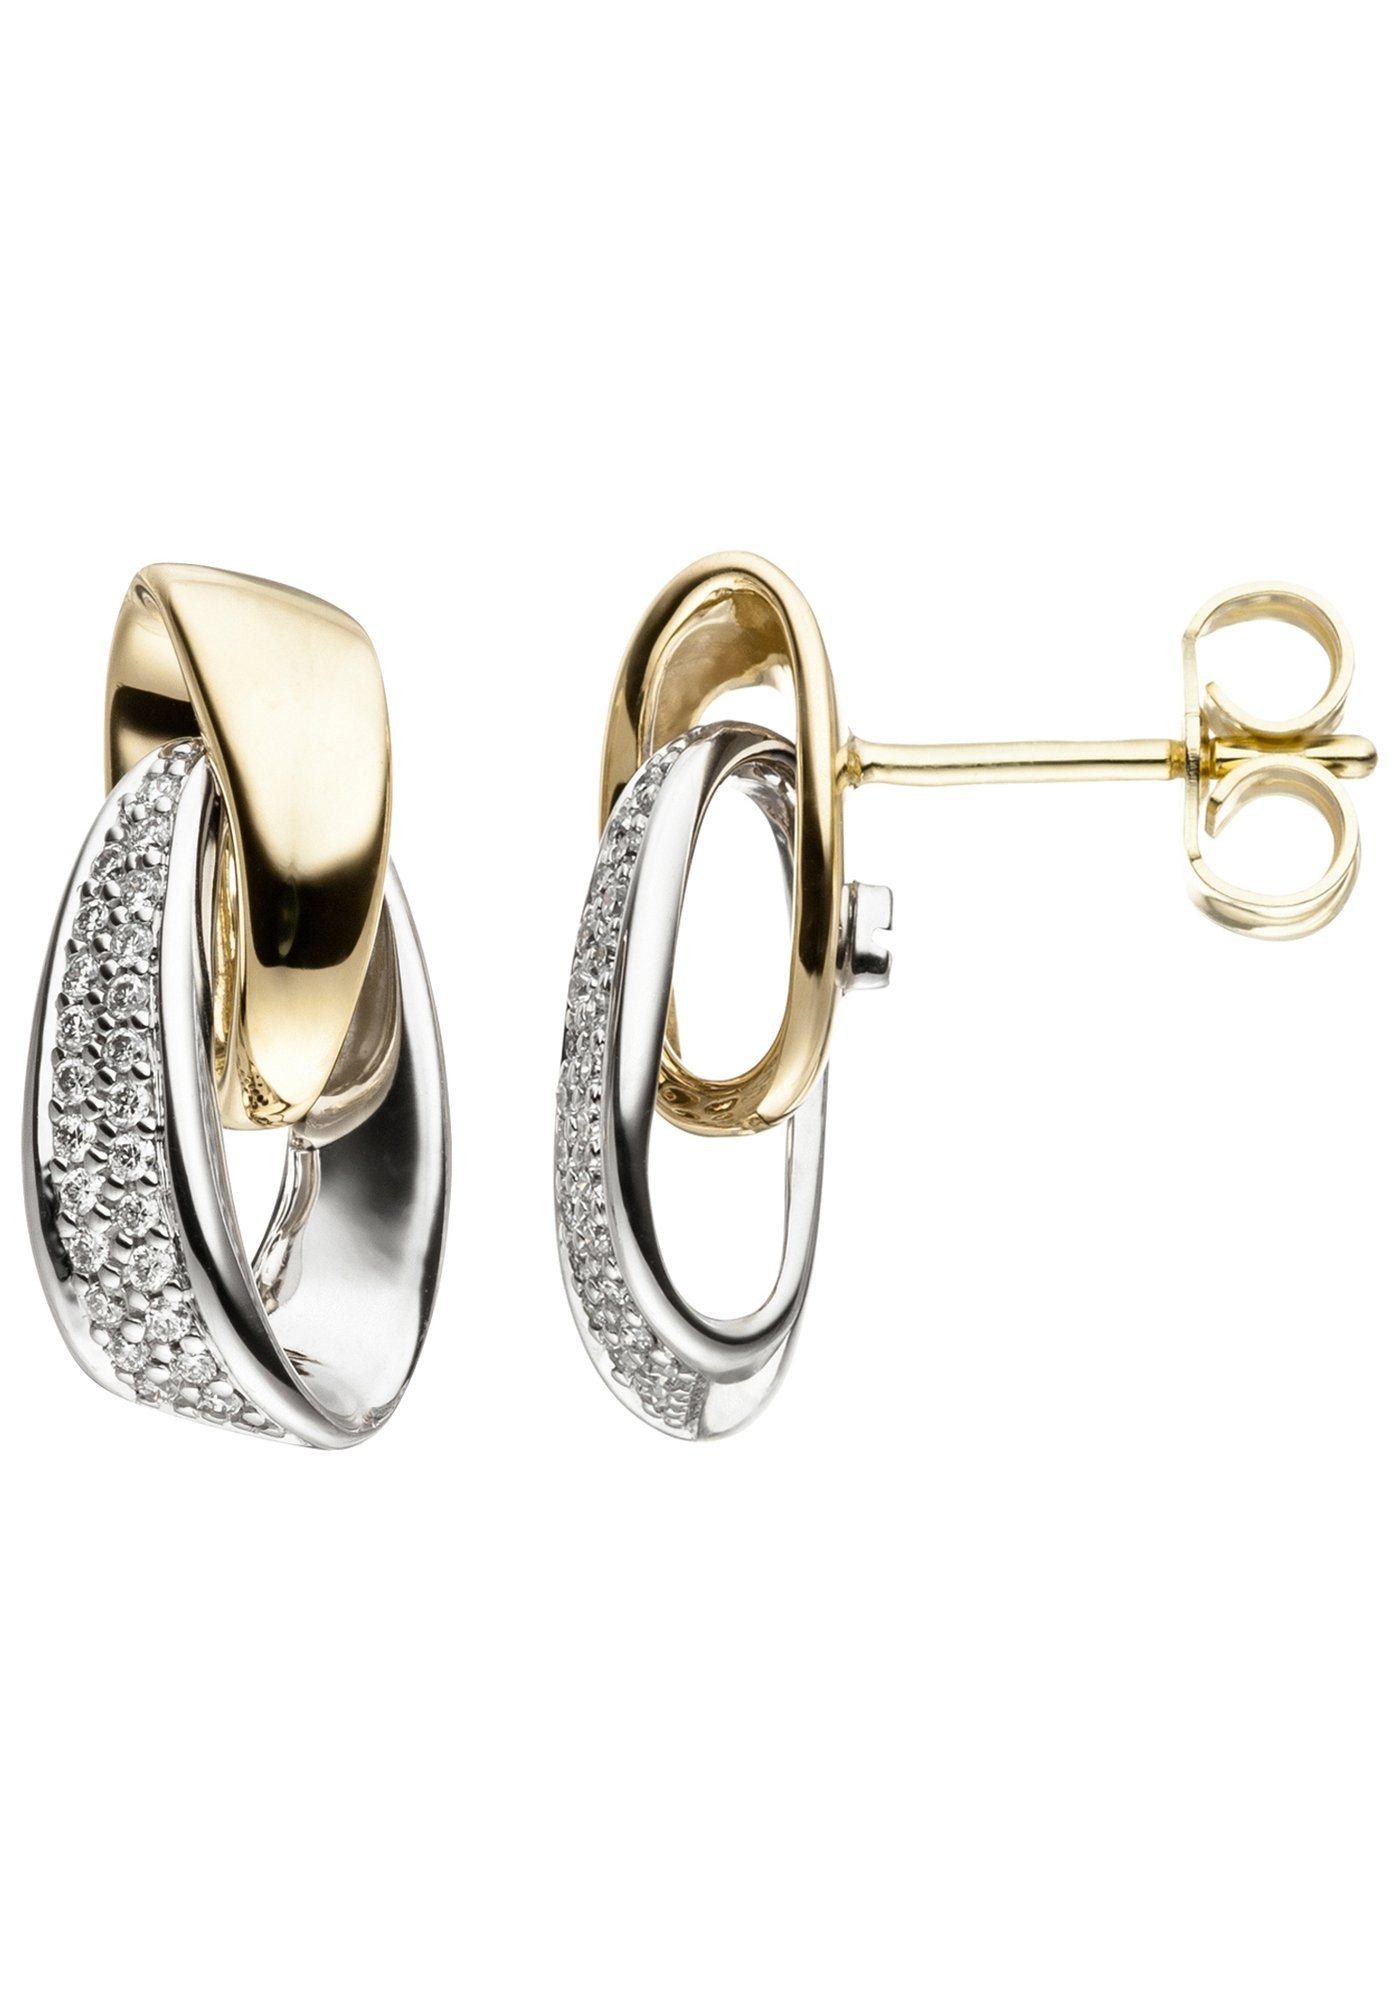 JOBO Paar Ohrstecker 585 Gold bicolor mit 48 Diamanten | Schmuck > Ohrschmuck & Ohrringe > Ohrstecker | Weißgold - Gold | Si | JOBO